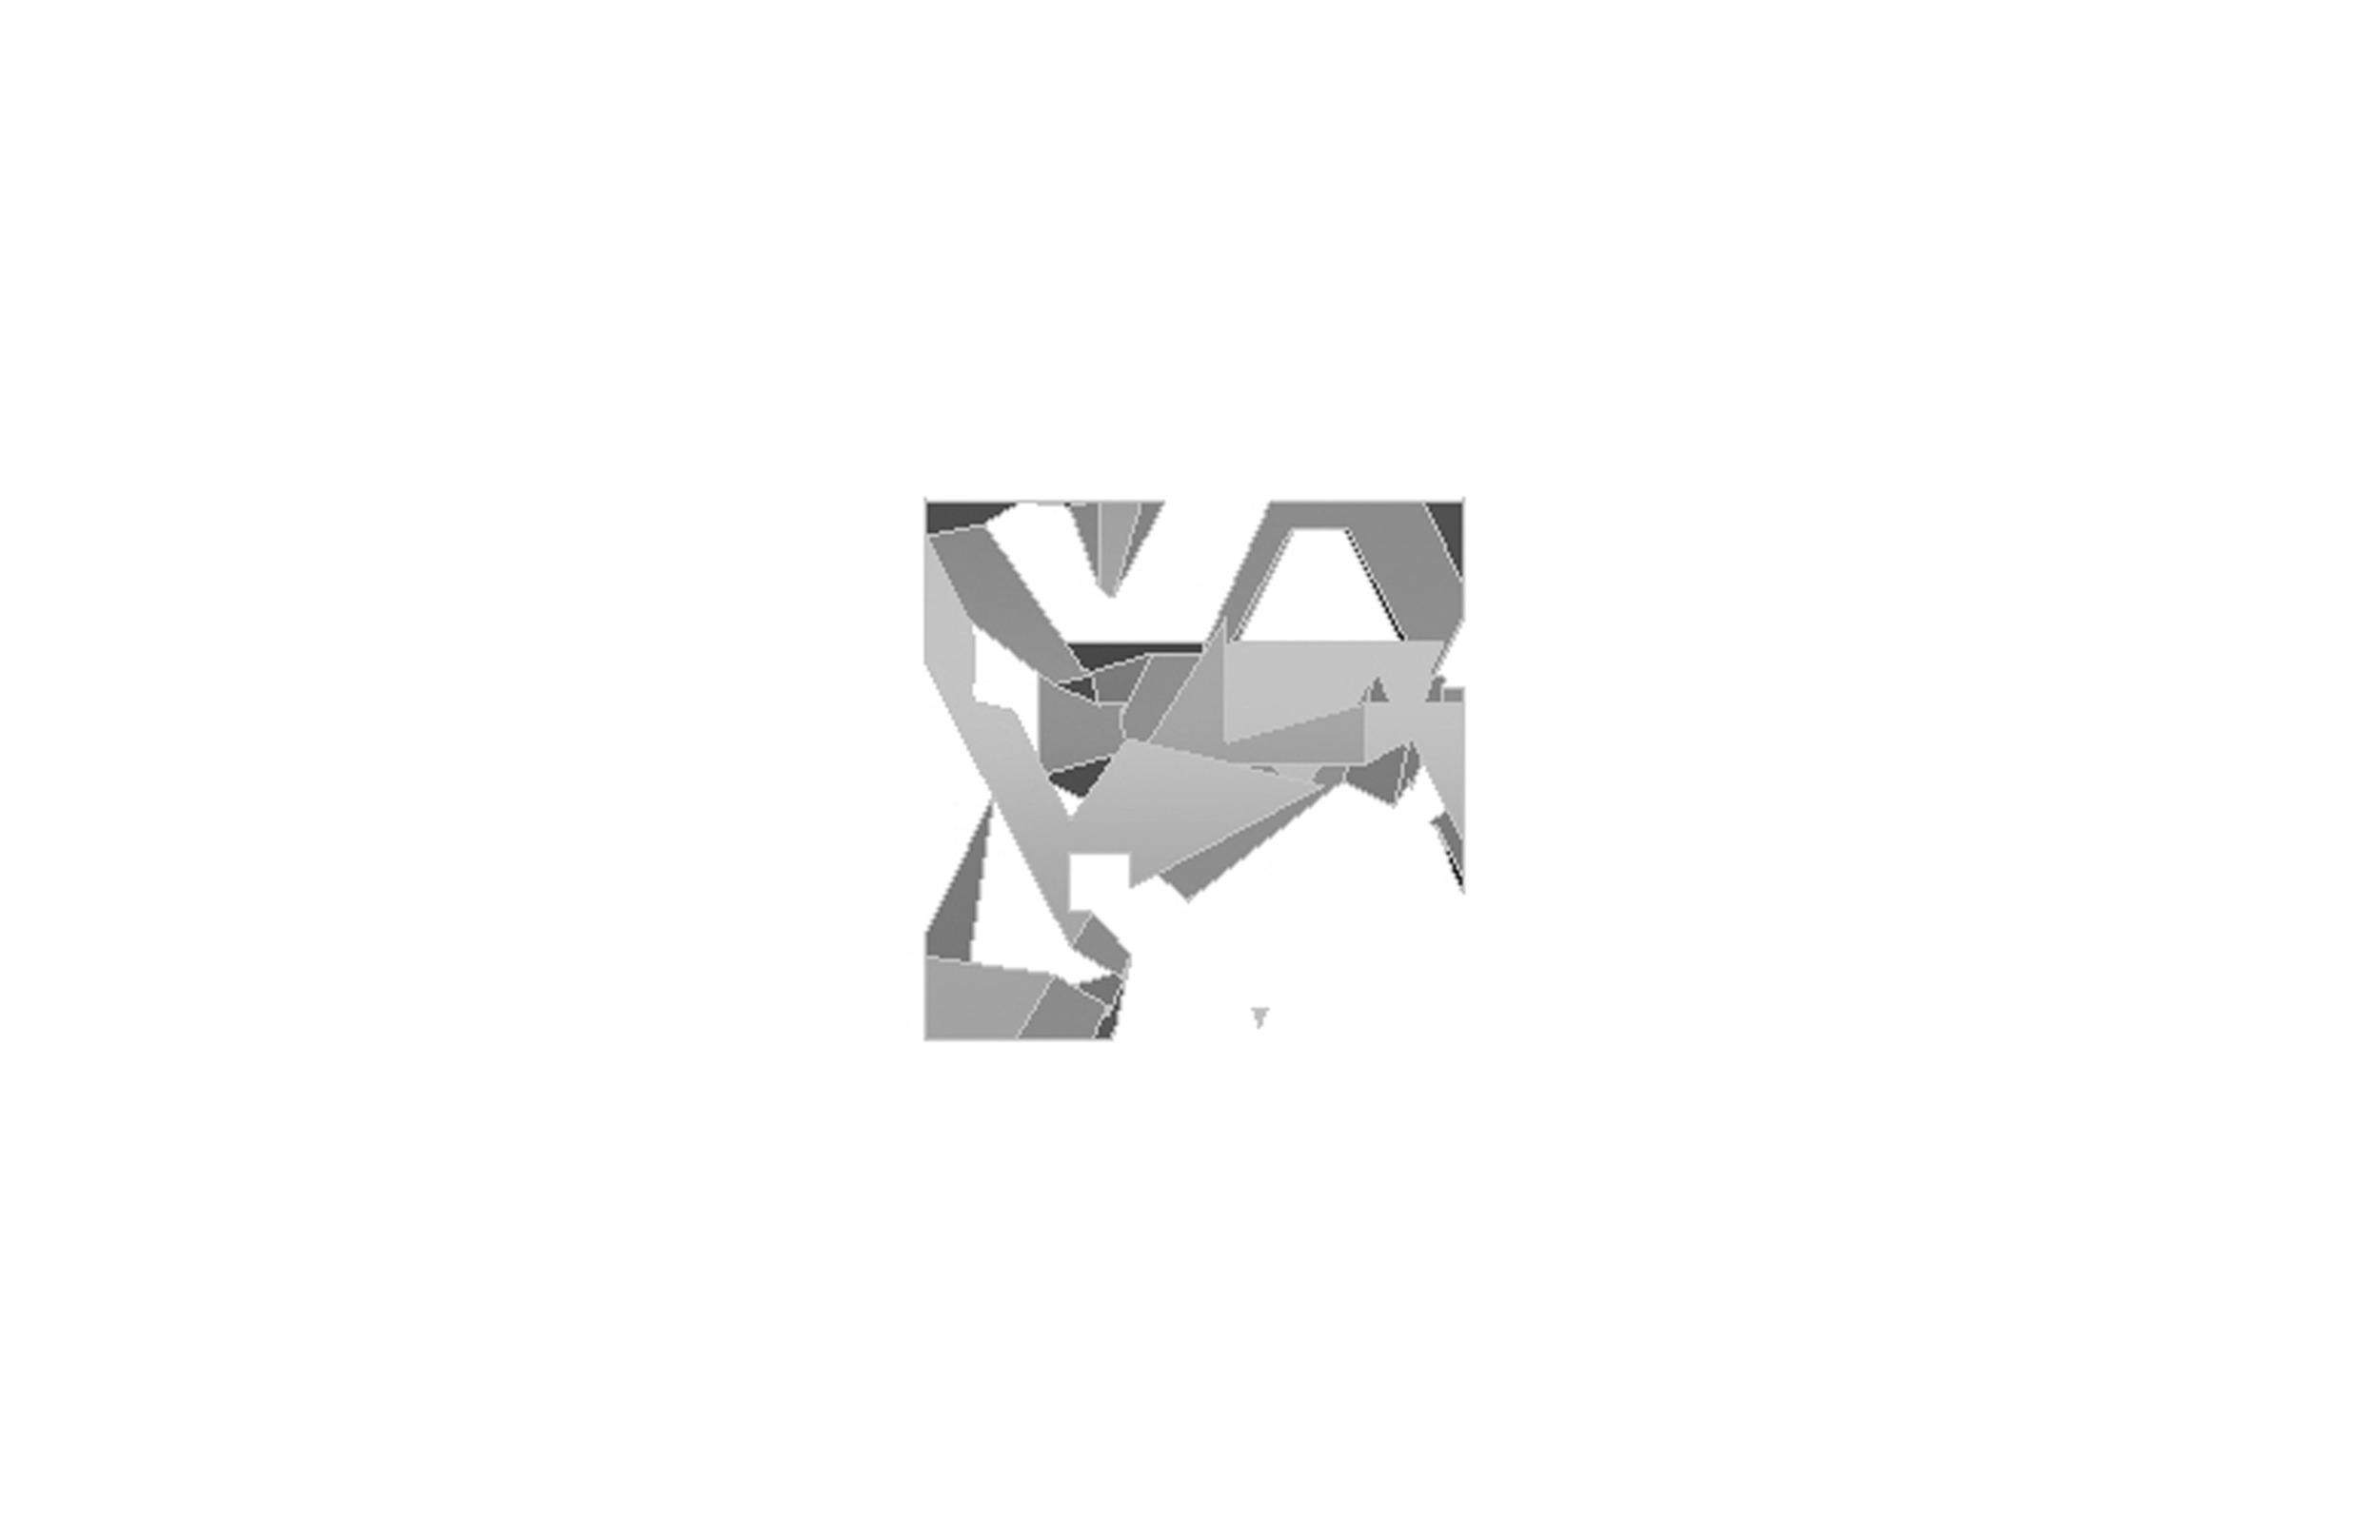 R_LACMA A+T Proposal_Primitive Translation_4.jpg